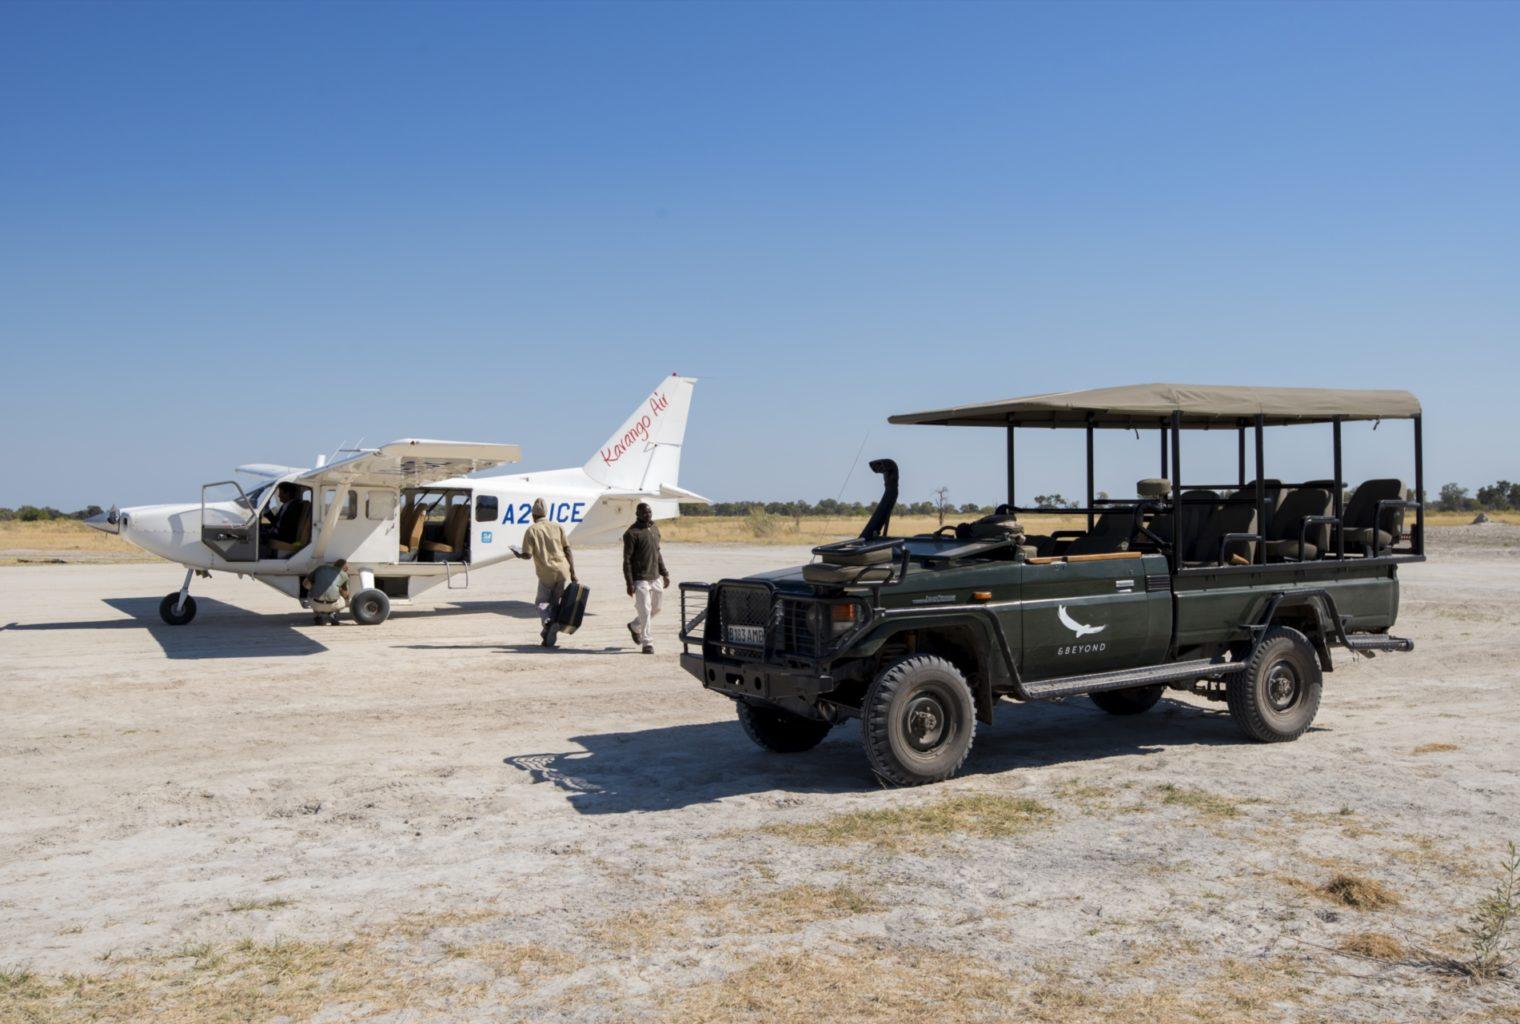 &Beyond, Xaranna, Okavango Delta, Camp, Arrival